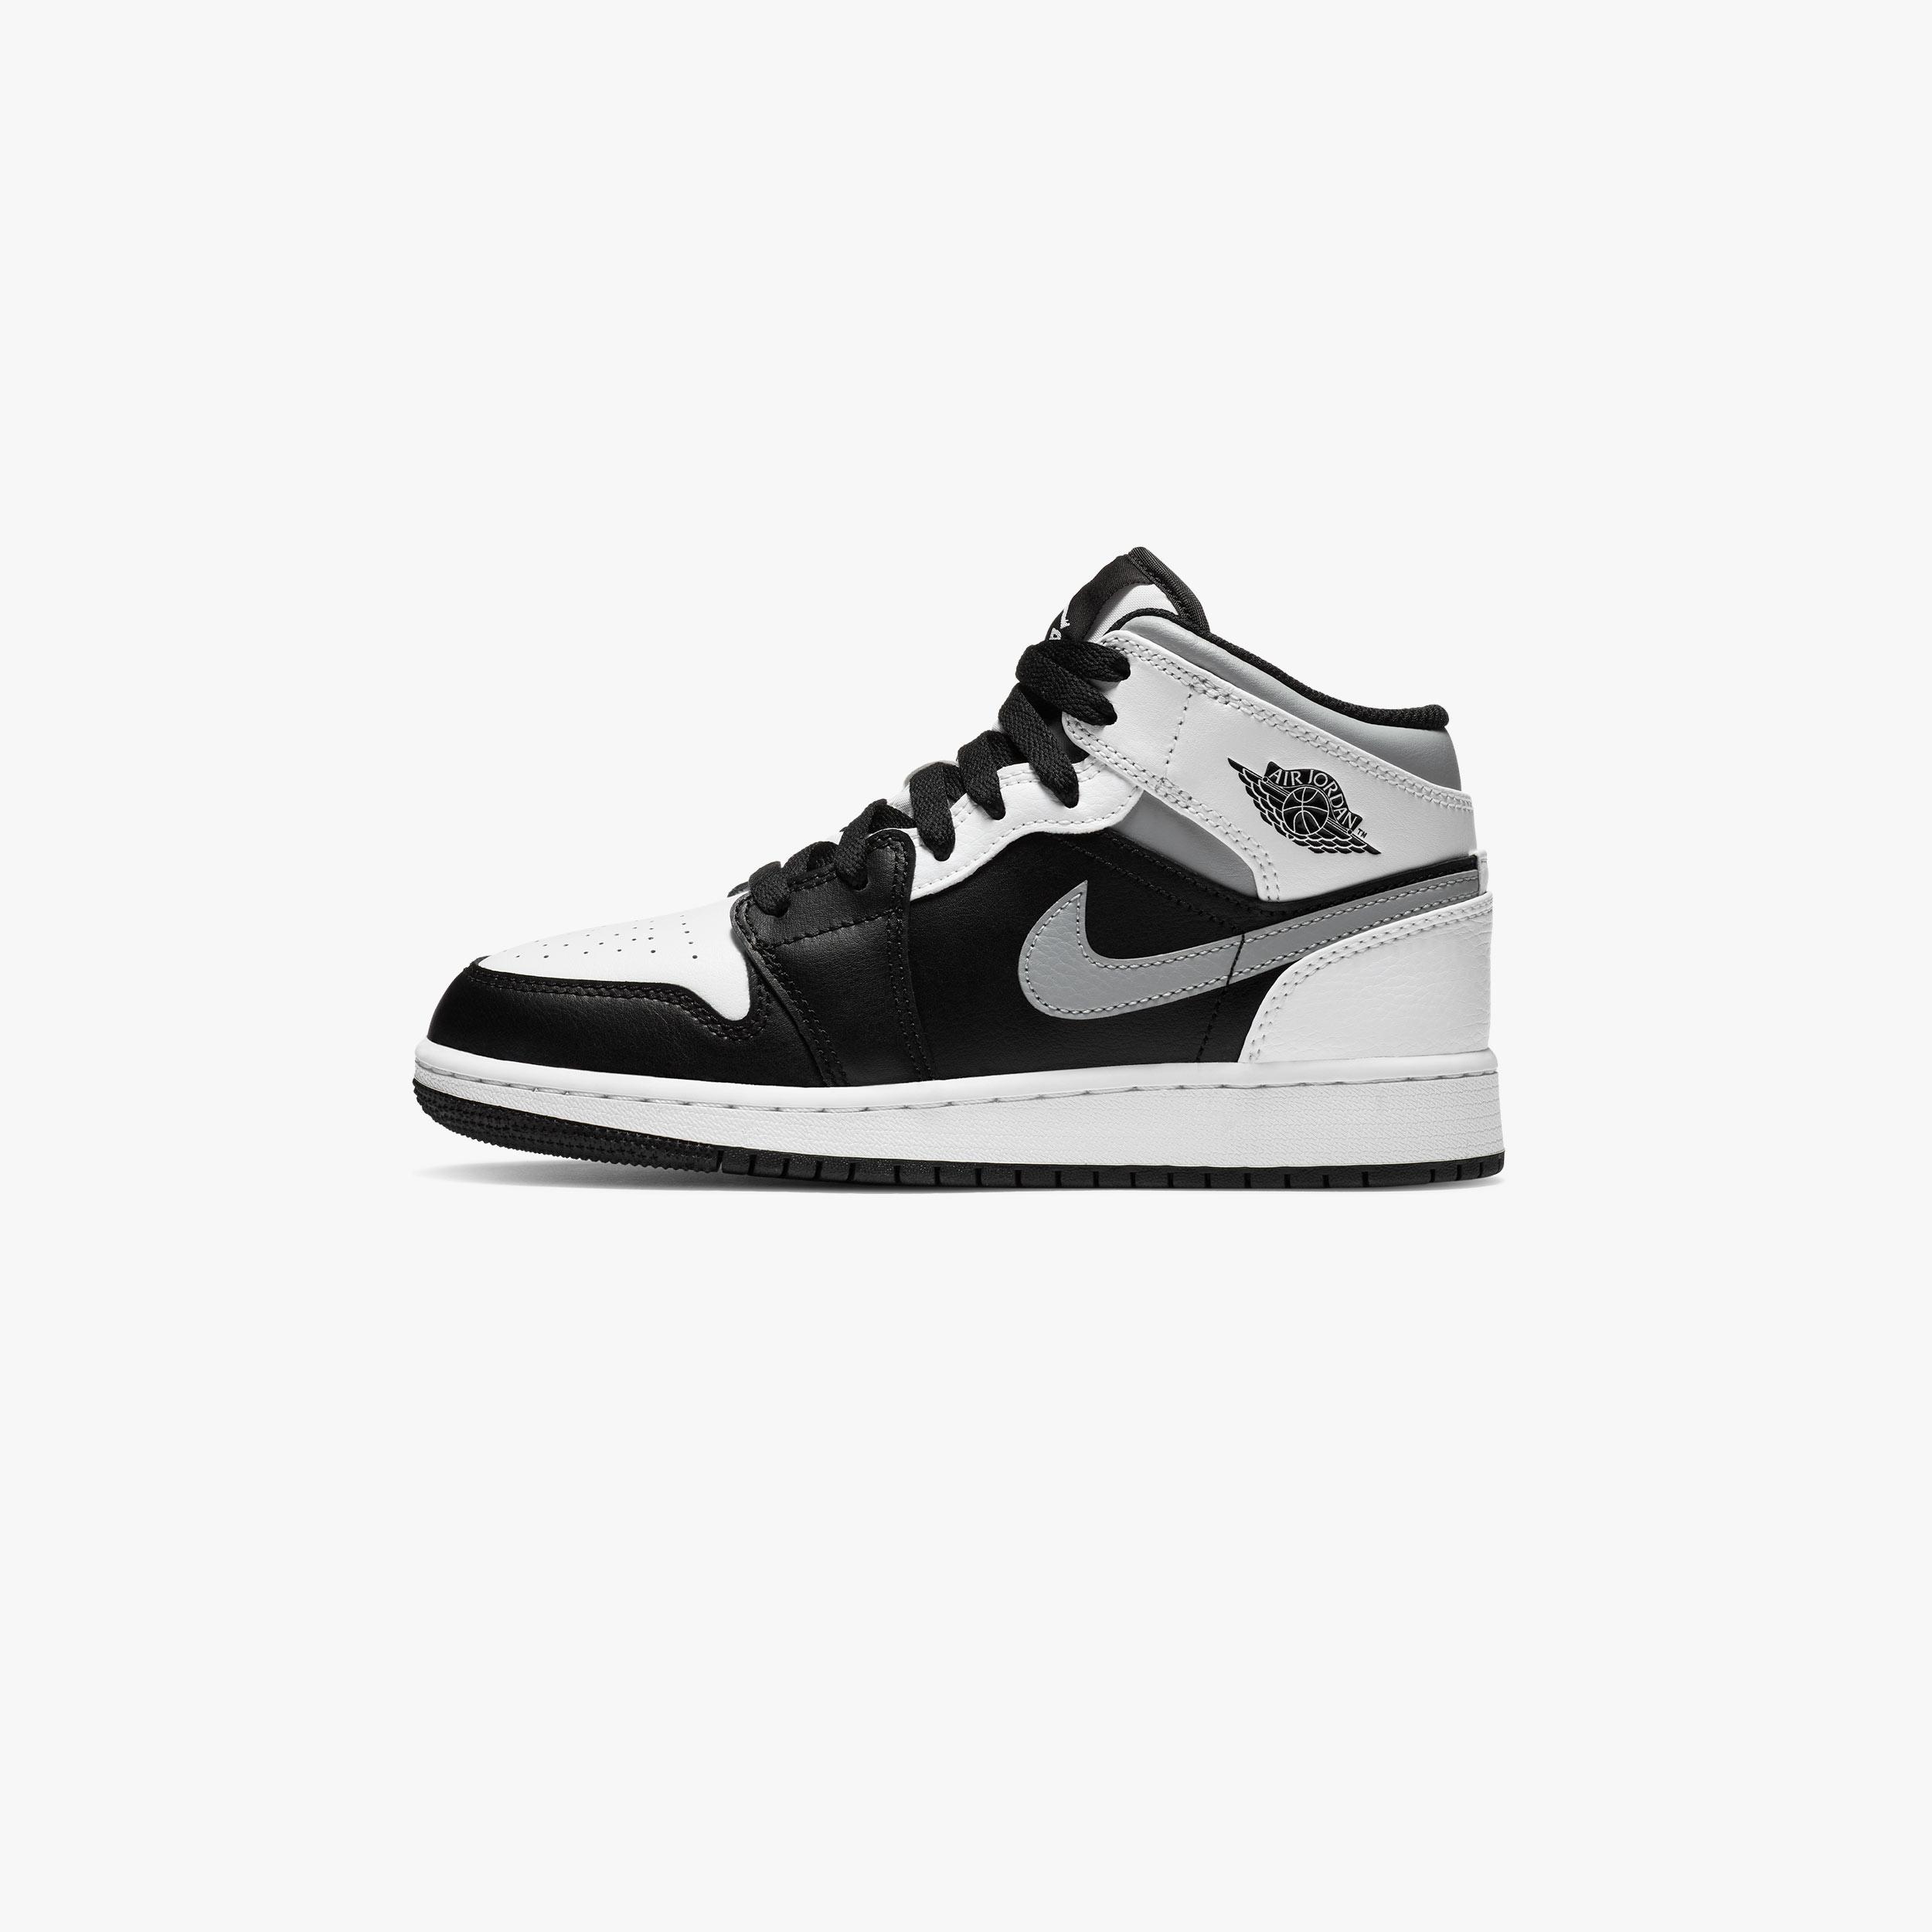 giay-sneaker-nam-nu-nike-jordan-1-mid-554725-073-gs-white-shadow-hang-chinh-hang